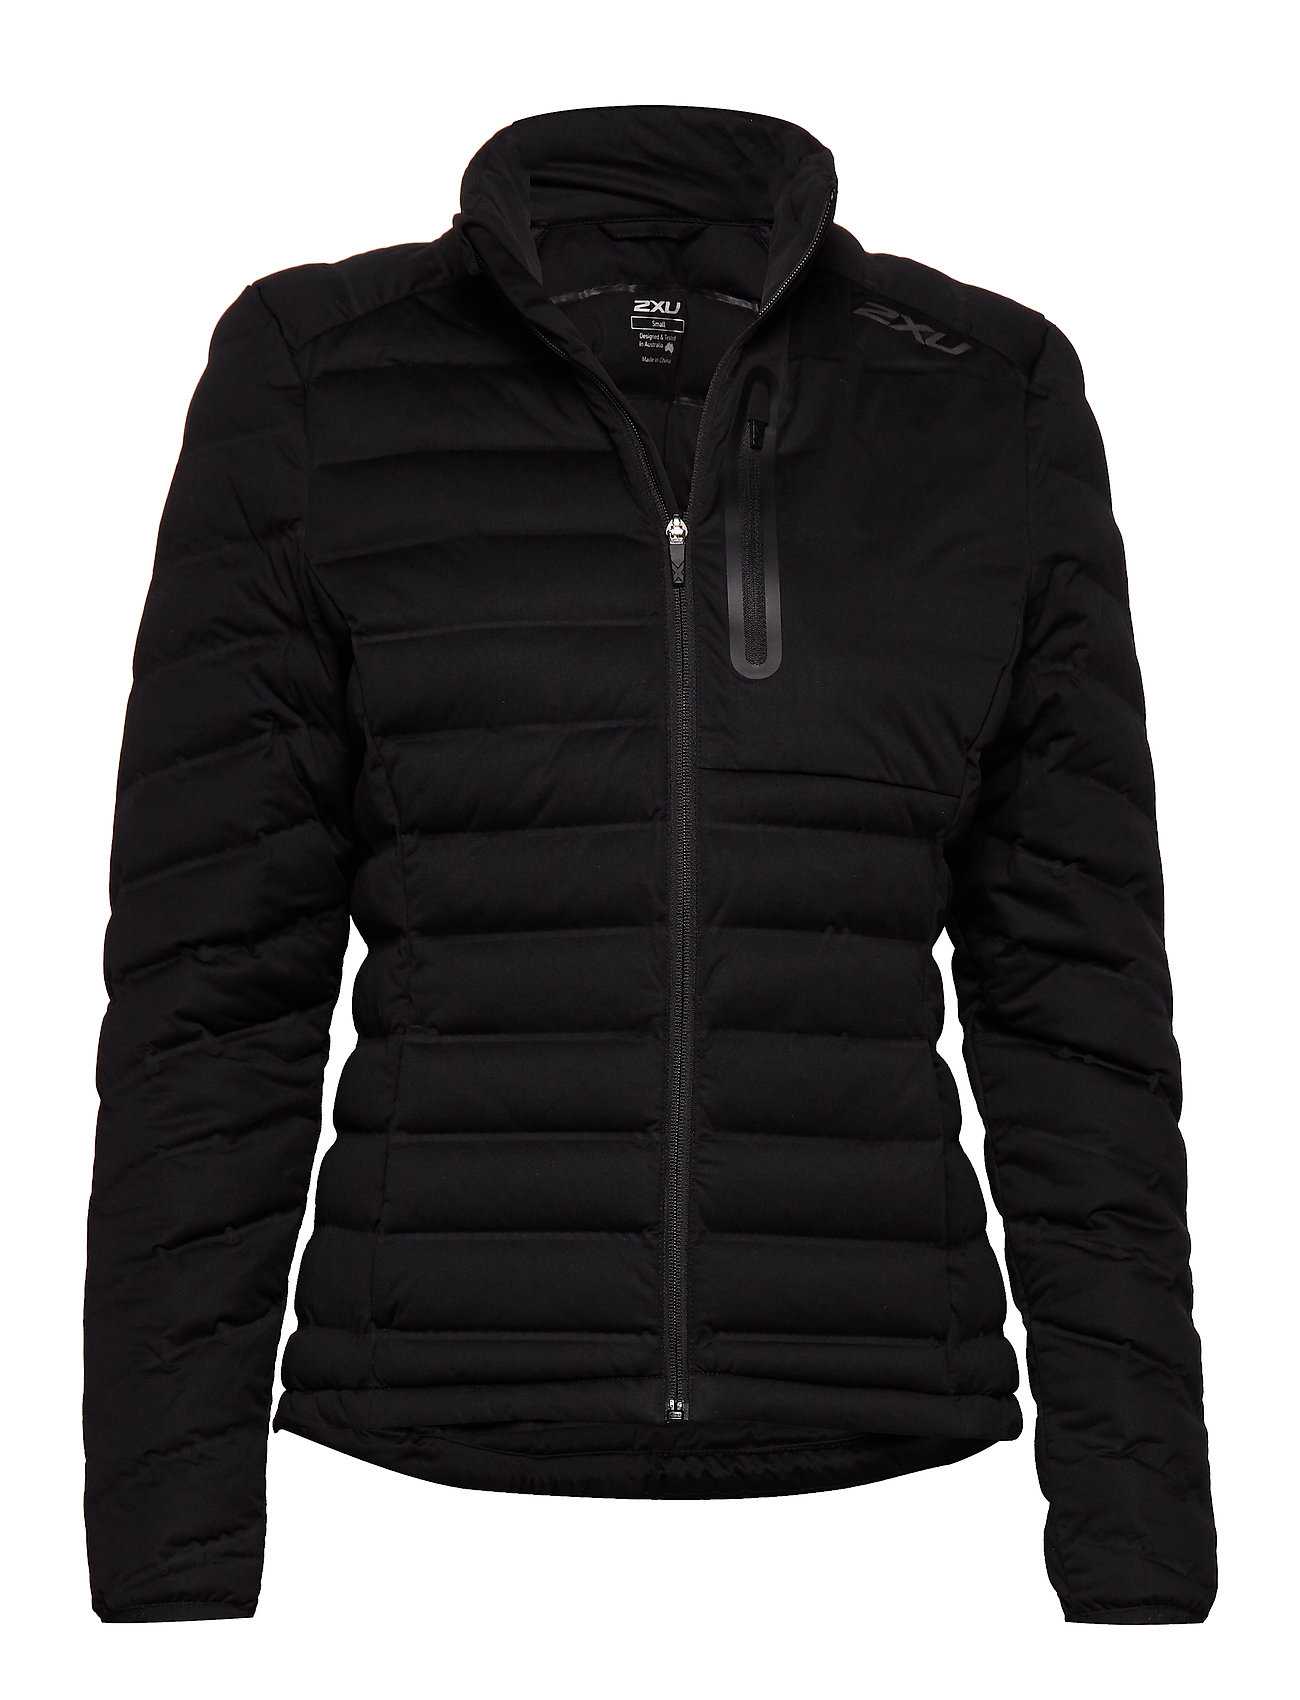 2XU Pursuit Insulation Jacket - BLACK/BLACK